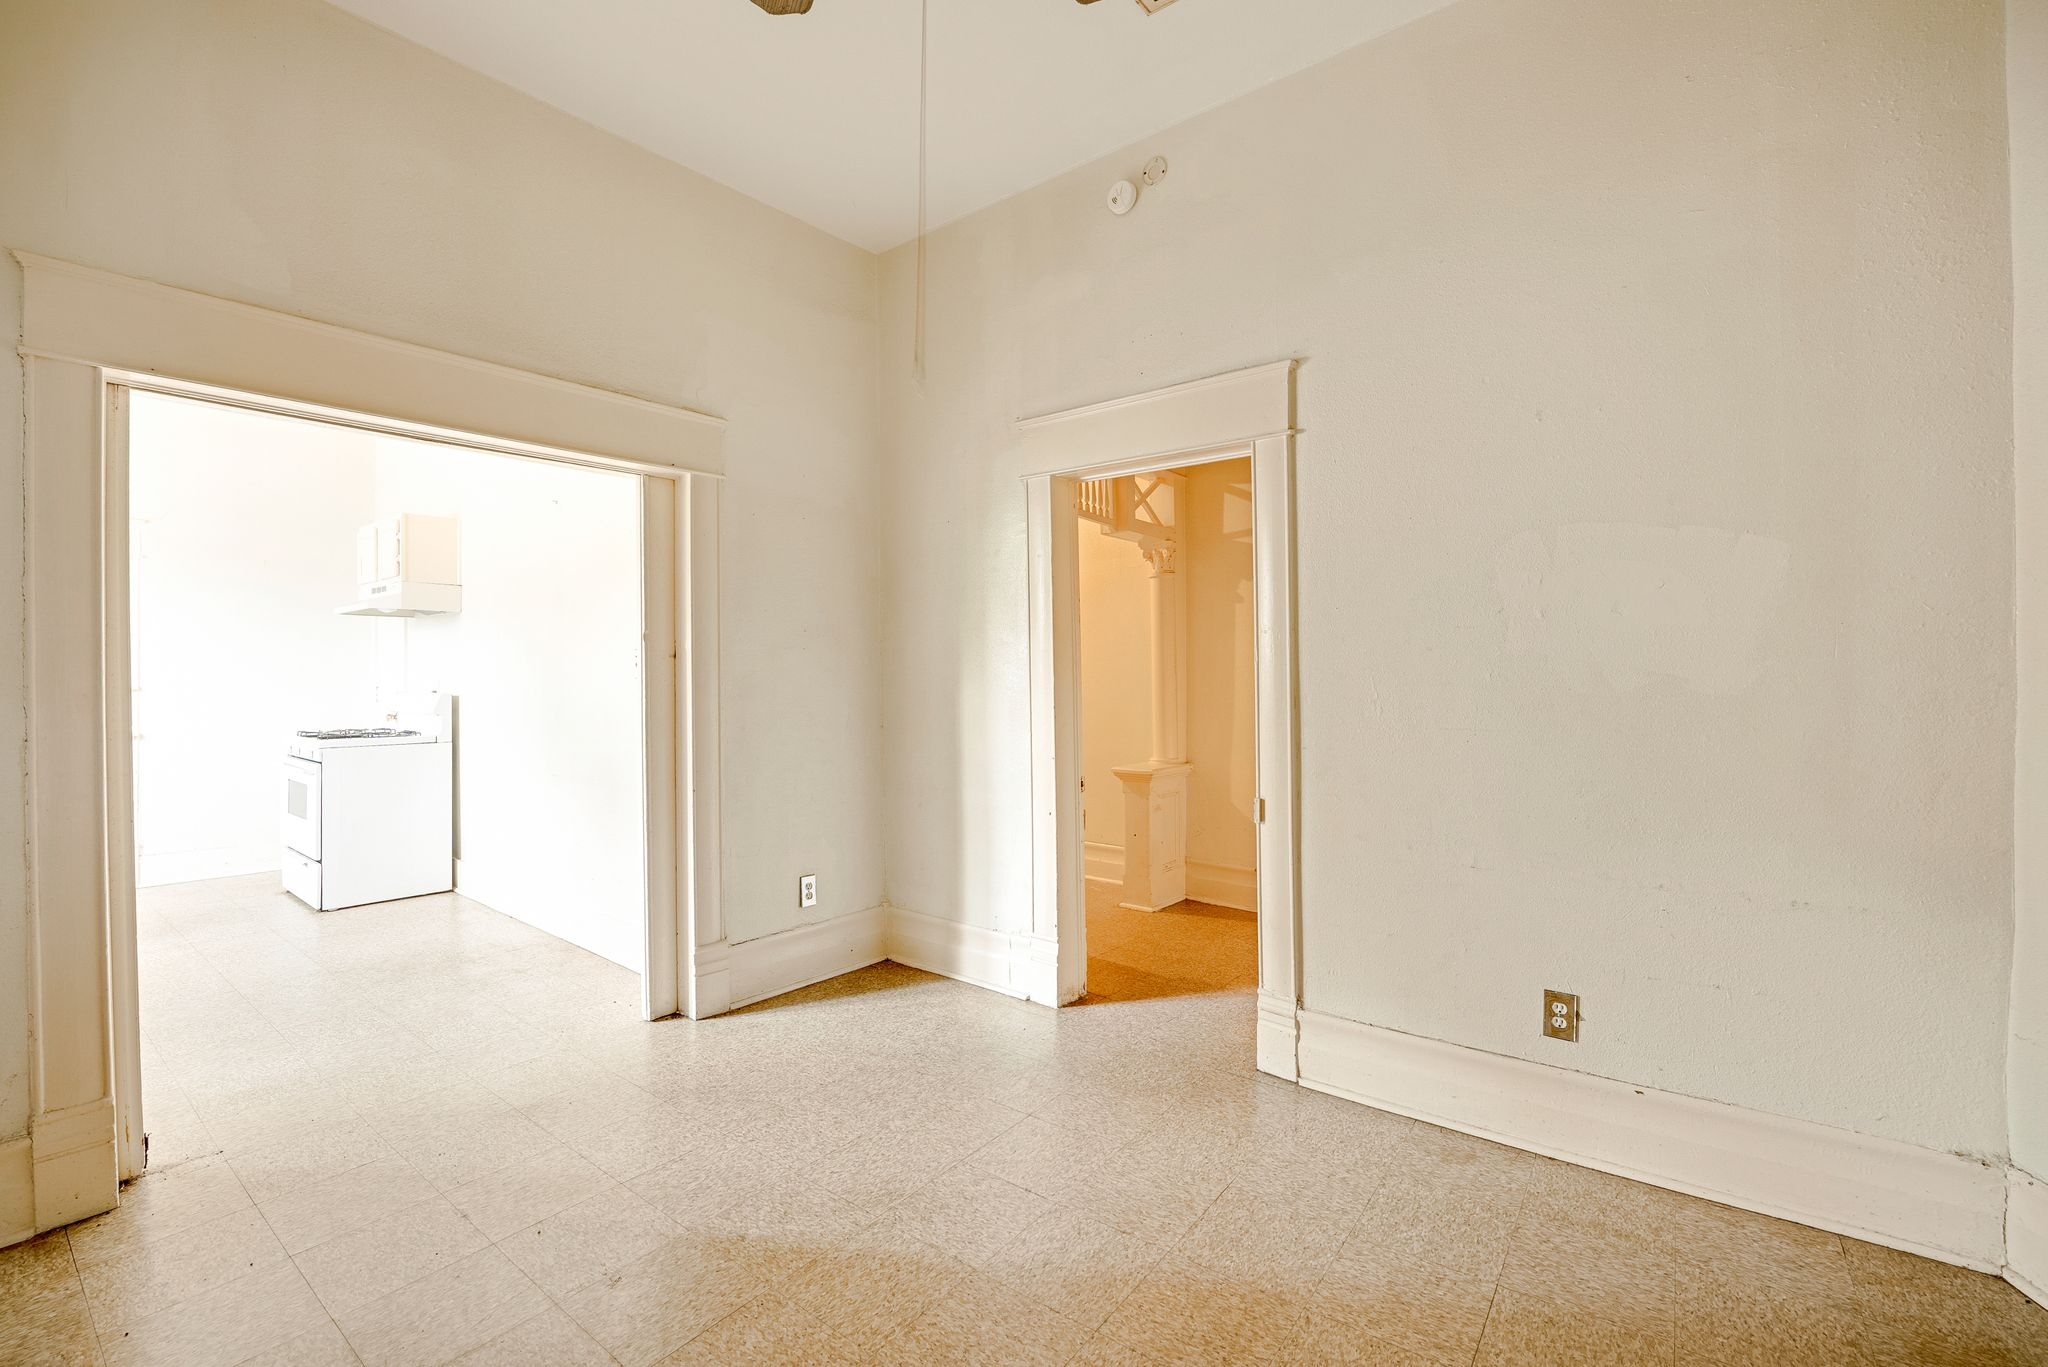 710 N New Braunfels Ave-123